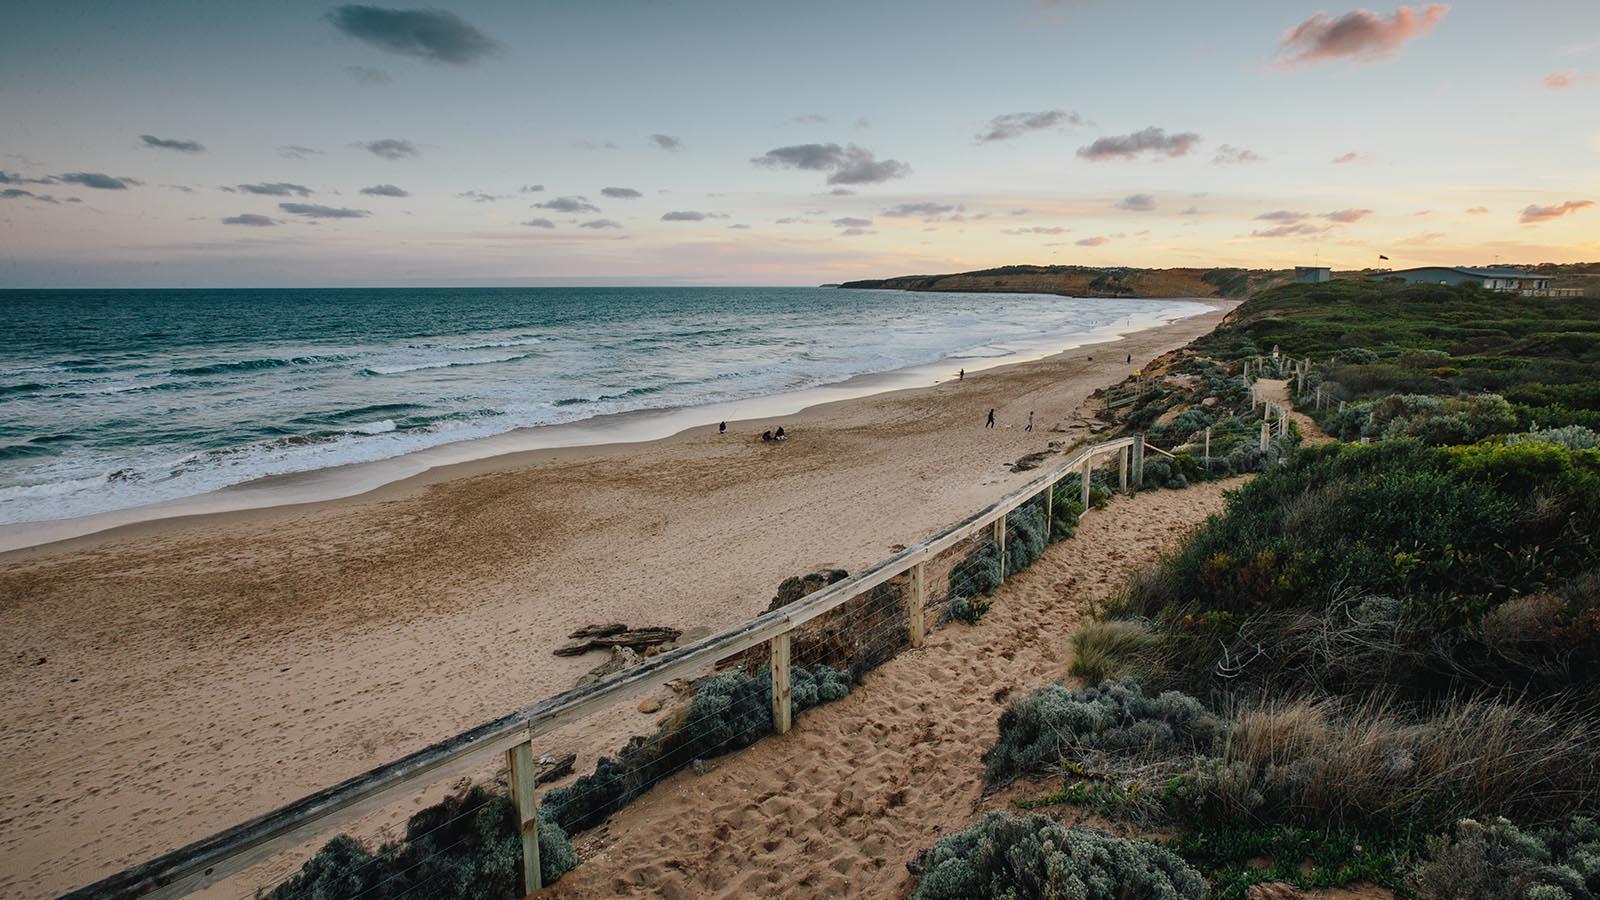 Jan Juc Beach, Great Ocean Road, Victoria, Australia